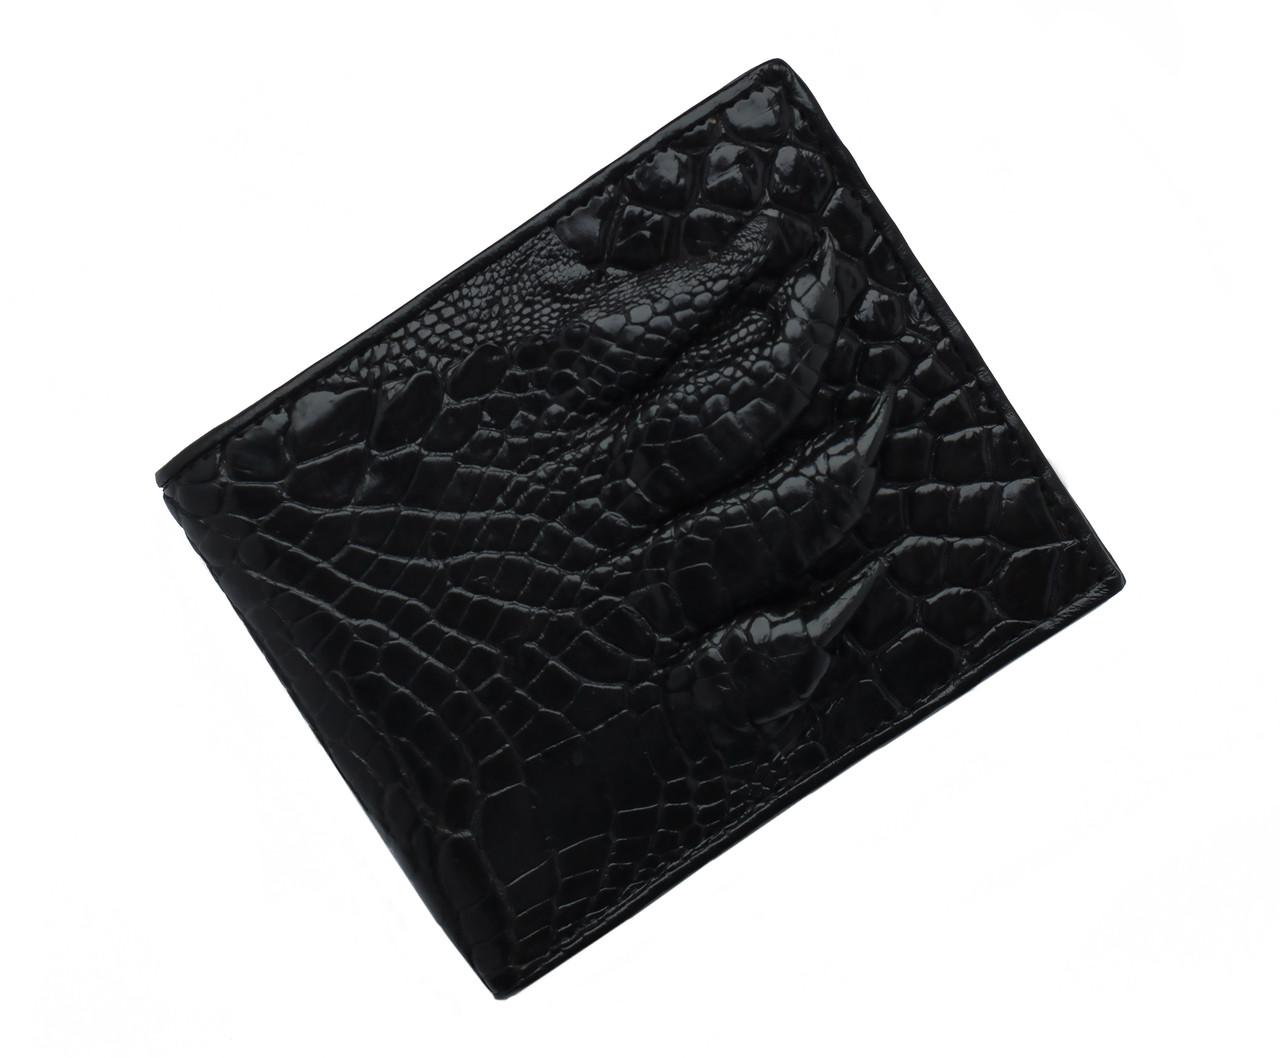 Портмоне из кожи с лапой крокодила Ekzotic Leather